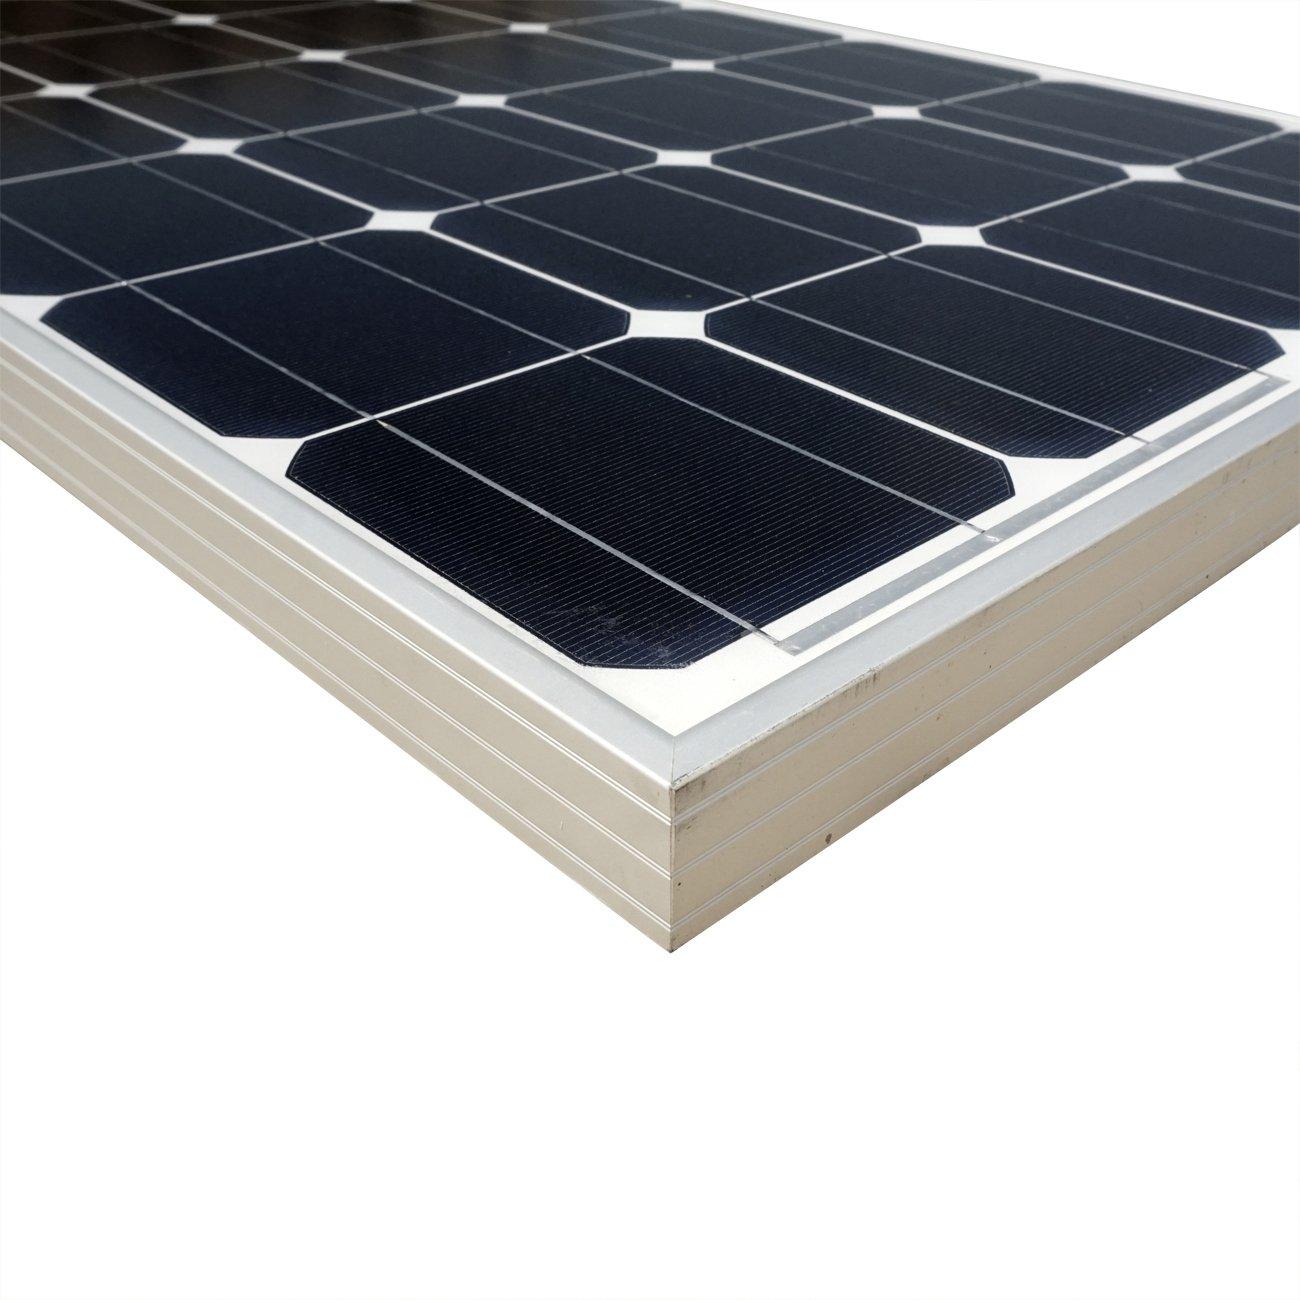 ECO-WORTHY 100 Watt Solar Panel 12 Volts Monocrystalline Solar Panel High Efficiency Mono Module RV Marine Boat Off Grid by ECO-WORTHY (Image #2)